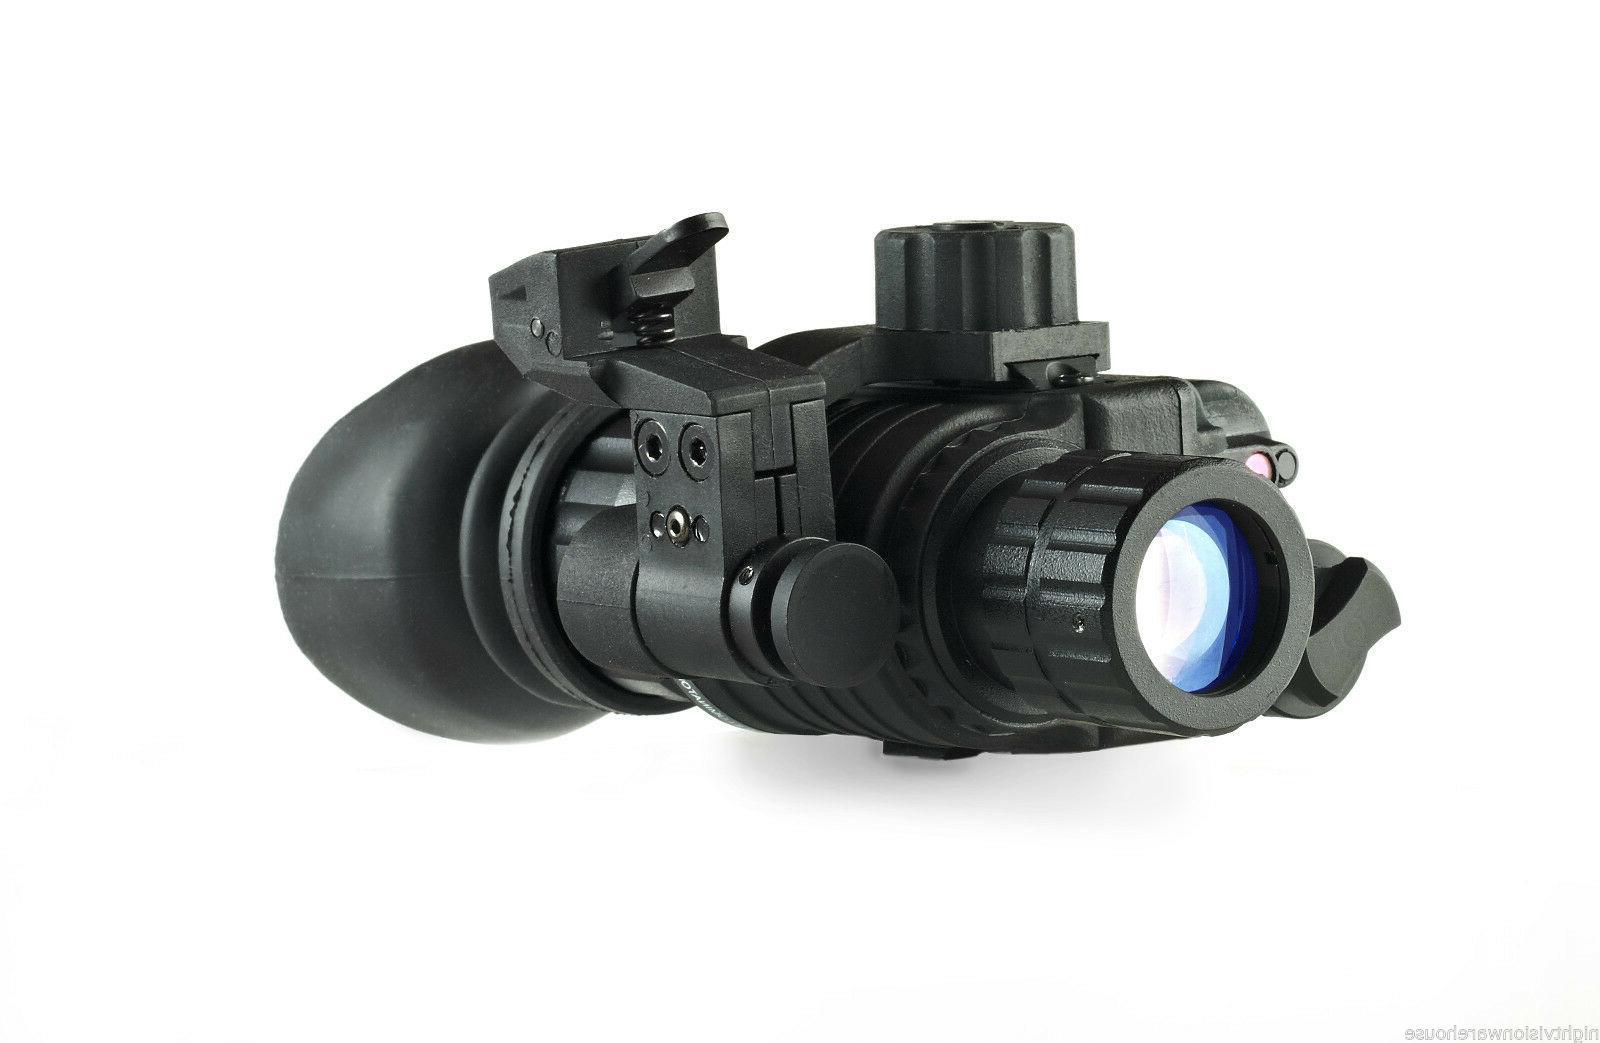 Bering Ocelot 1.0x24 Gen Night Vision Monocular with